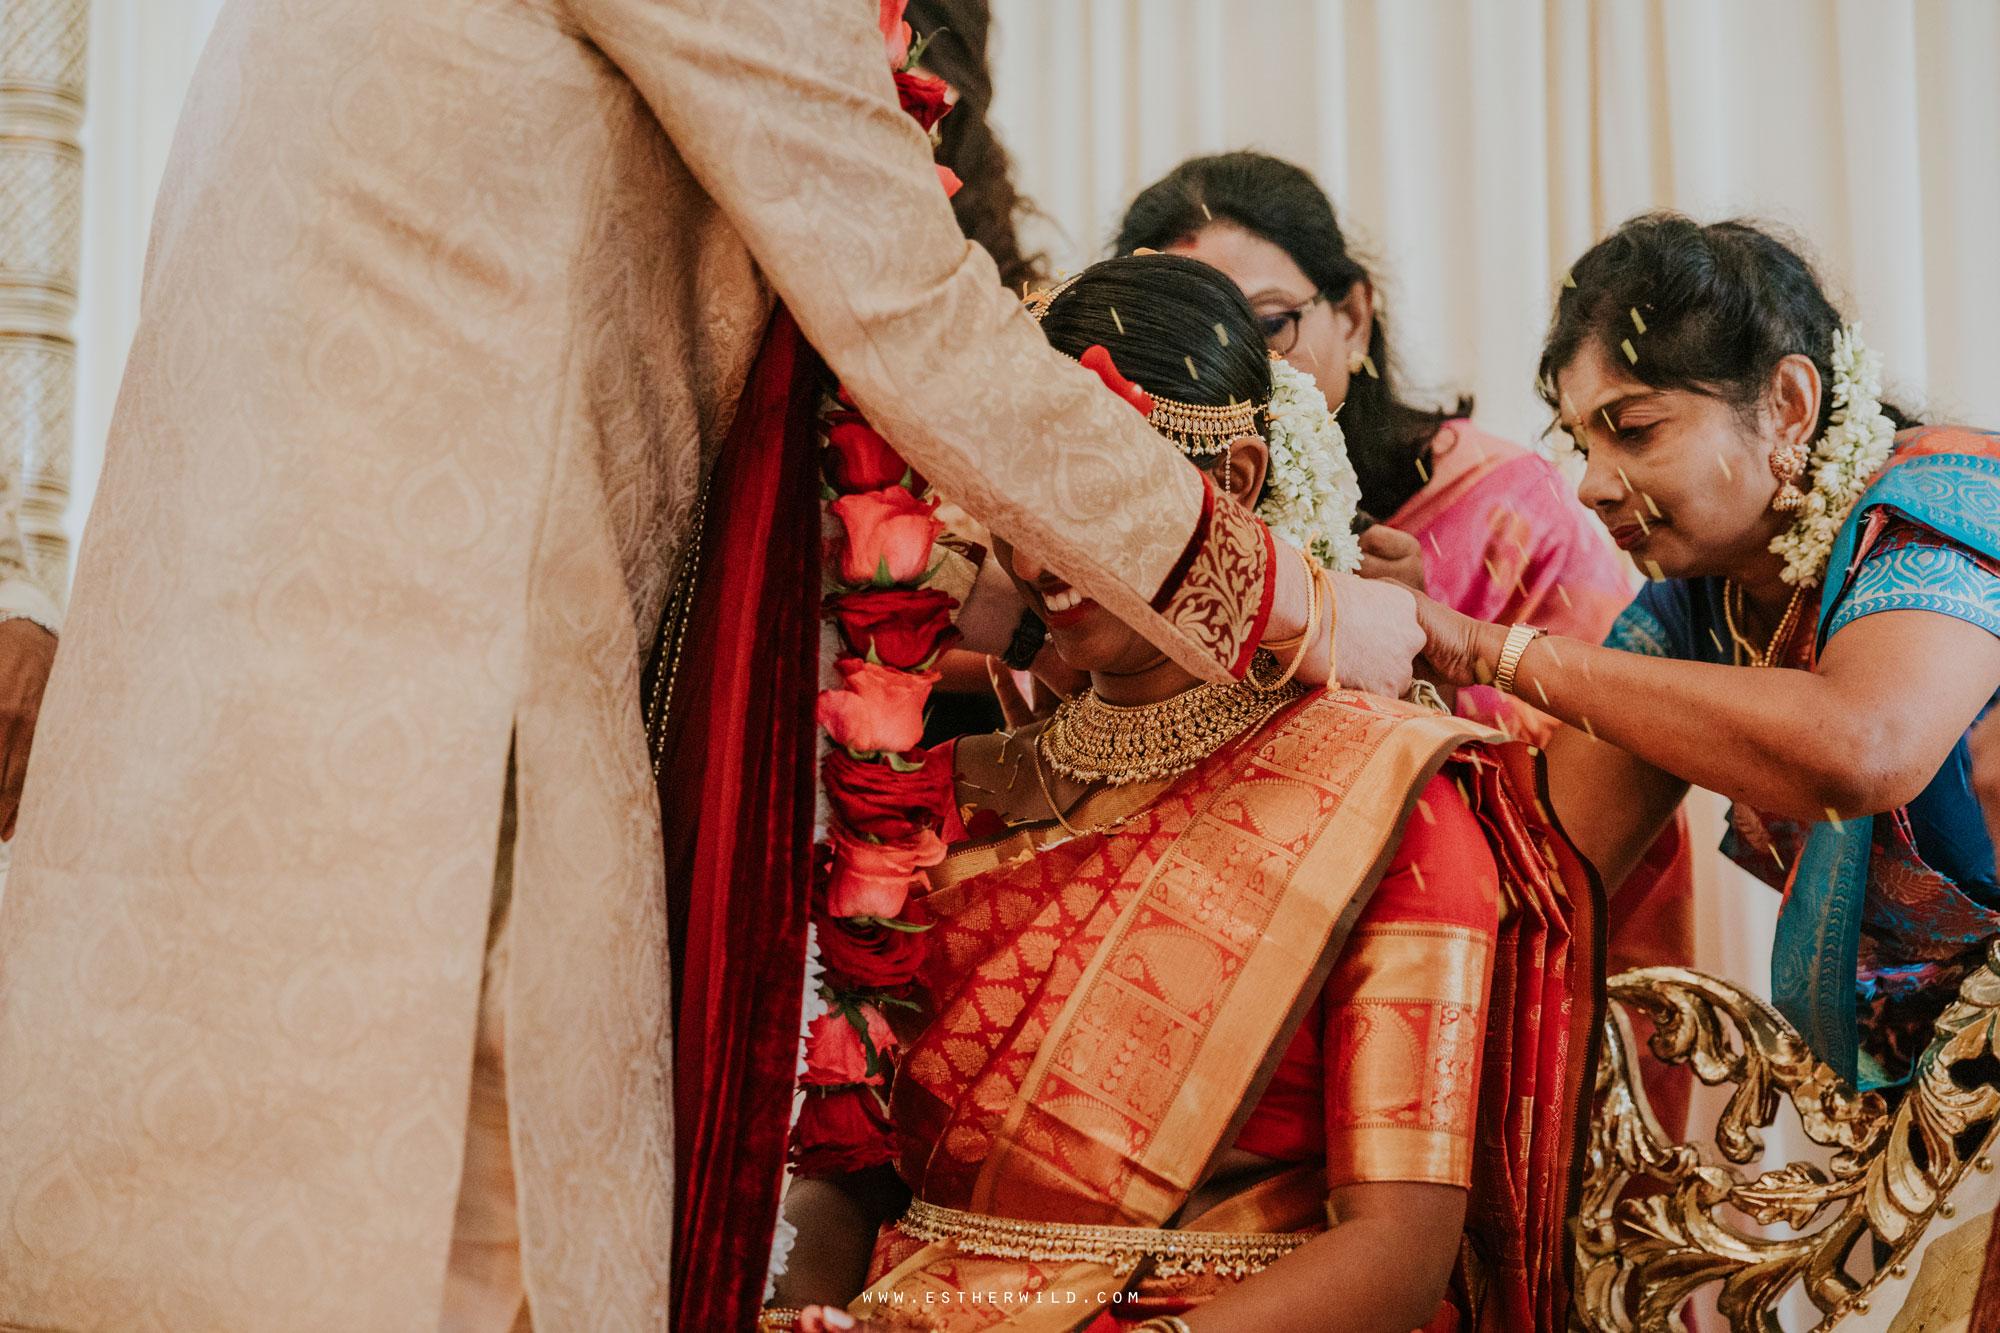 Northbrook_Park_Farnham_Surrey_London_Wedding_Hindu_Fusion_Esther_Wild_Photographer_IMG_4515.jpg